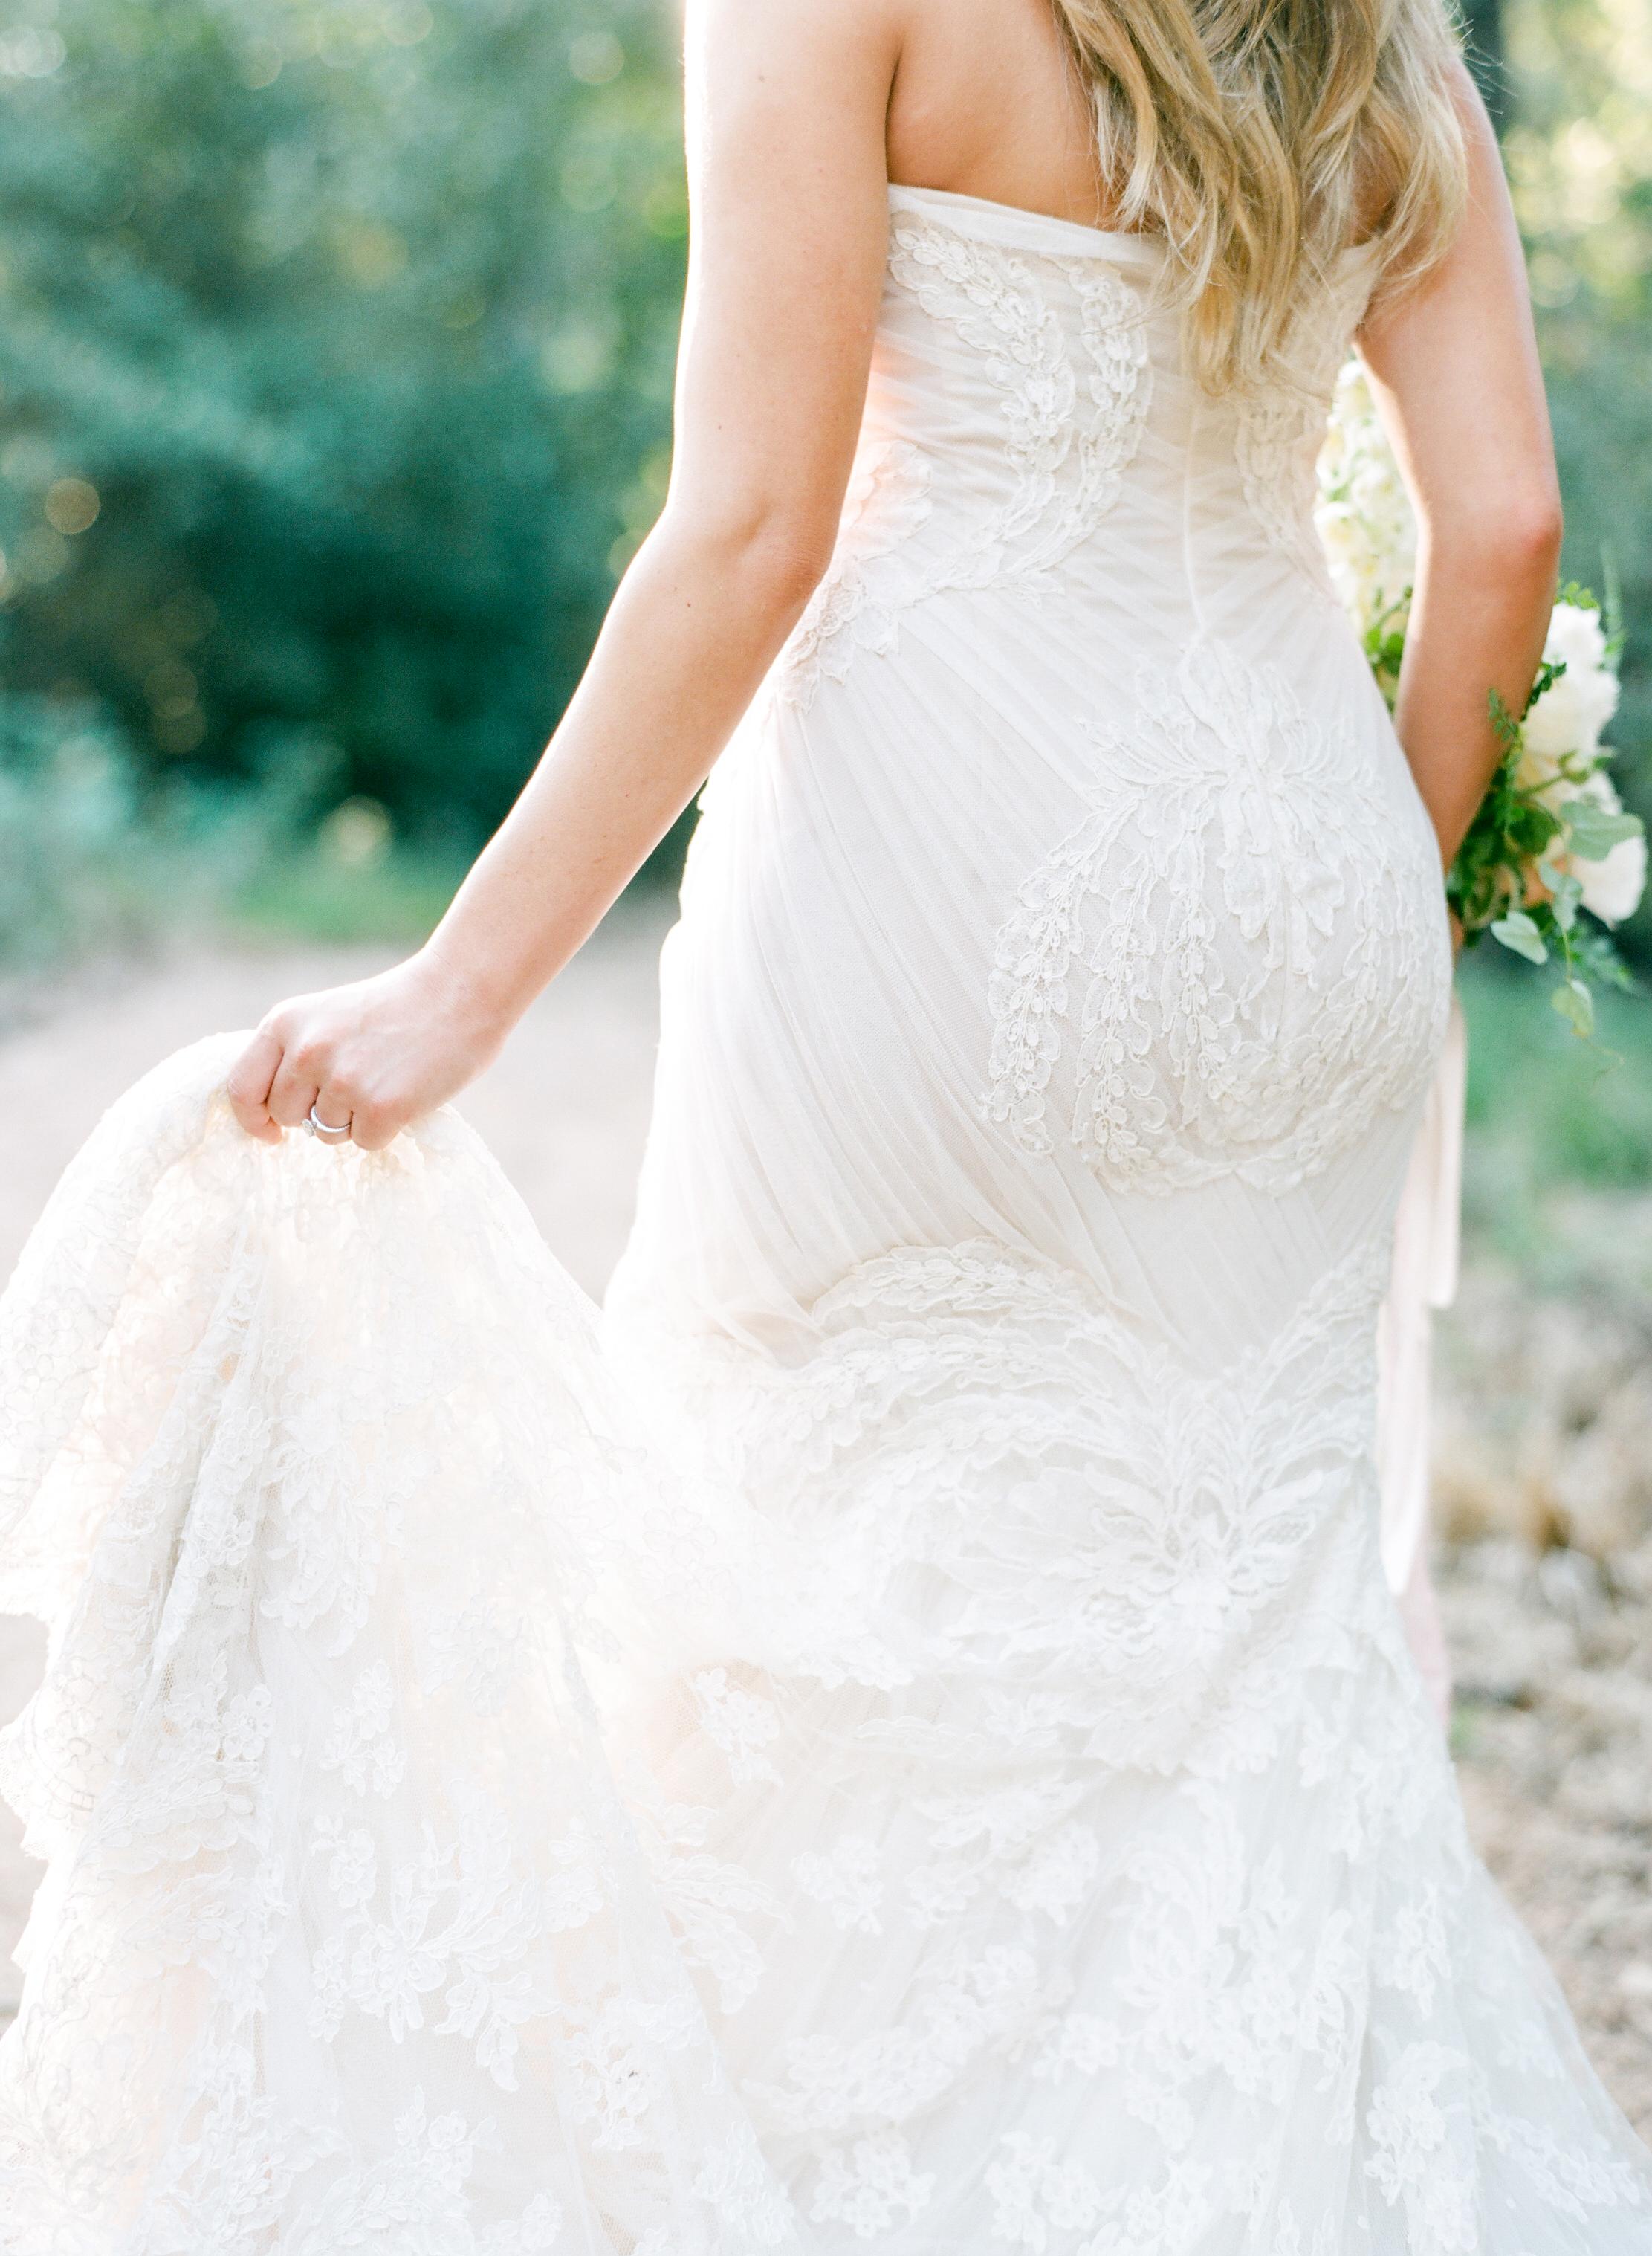 dana-fernandez-photography-the-wedding-chicks-film-houston-wedding-photography-destination-13.jpg